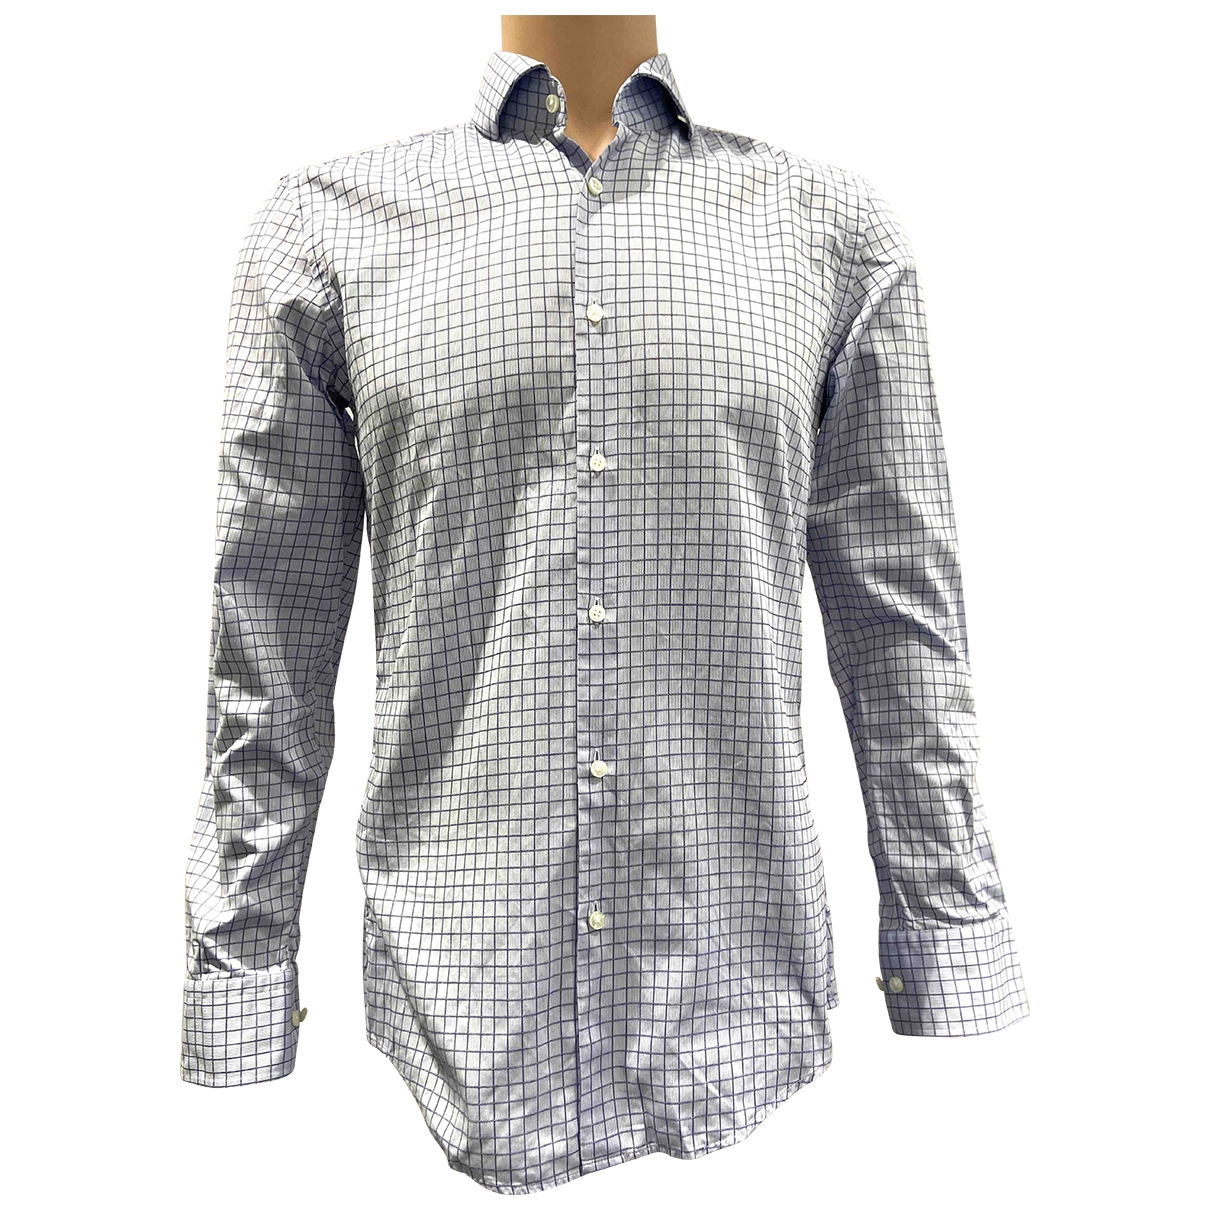 Boss \N Blue Cotton Shirts for Men 38 EU (tour de cou / collar)